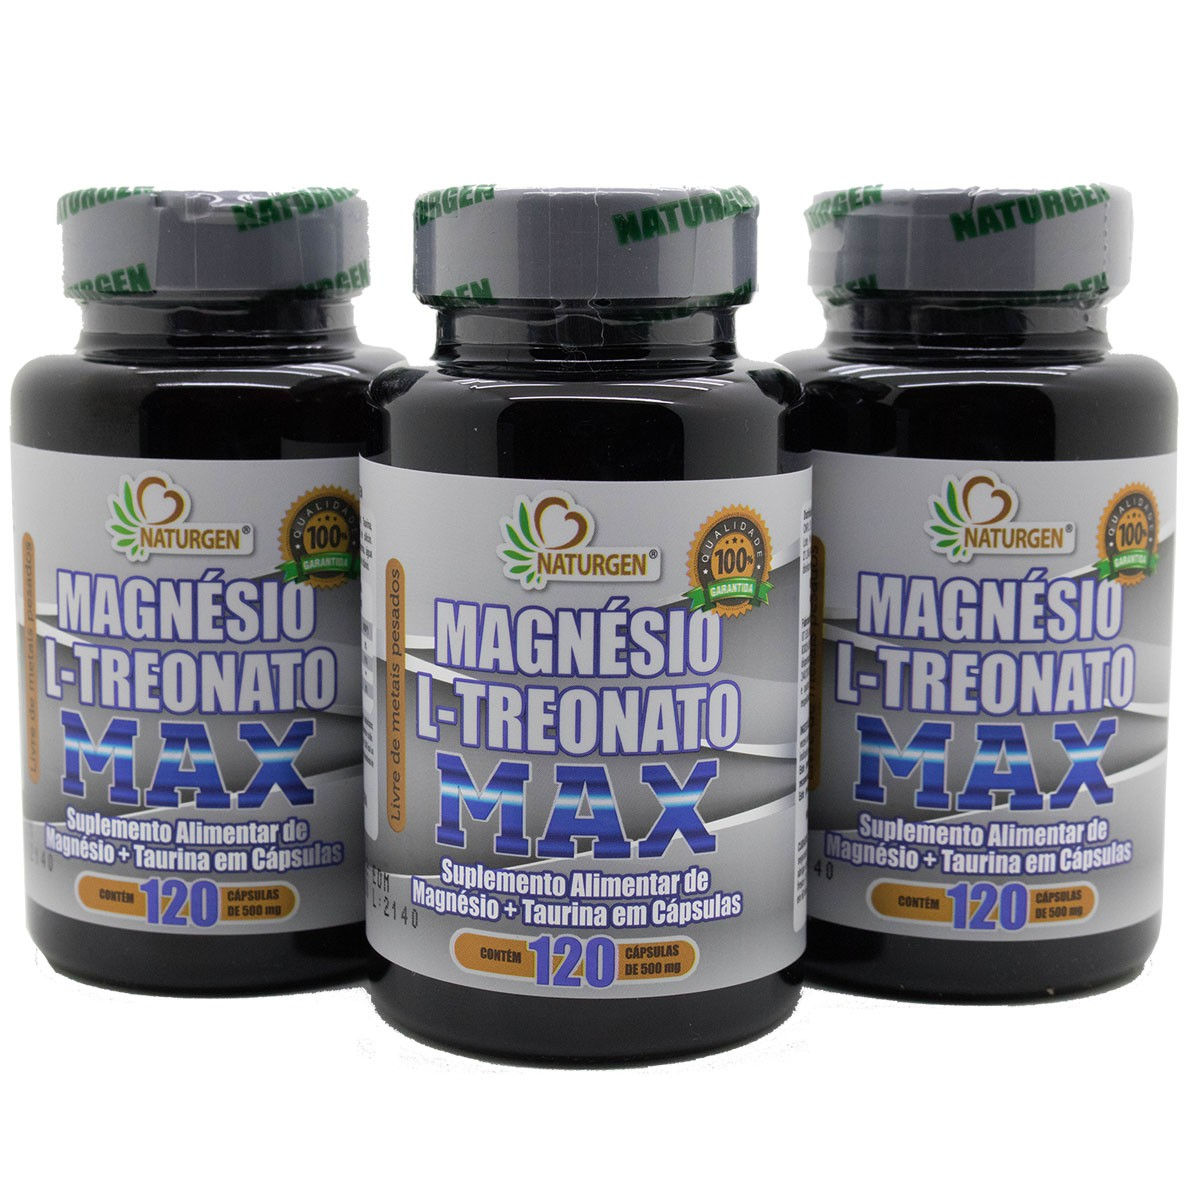 3 Magnesio L Treonato com taurina 500mg 120 capsulas